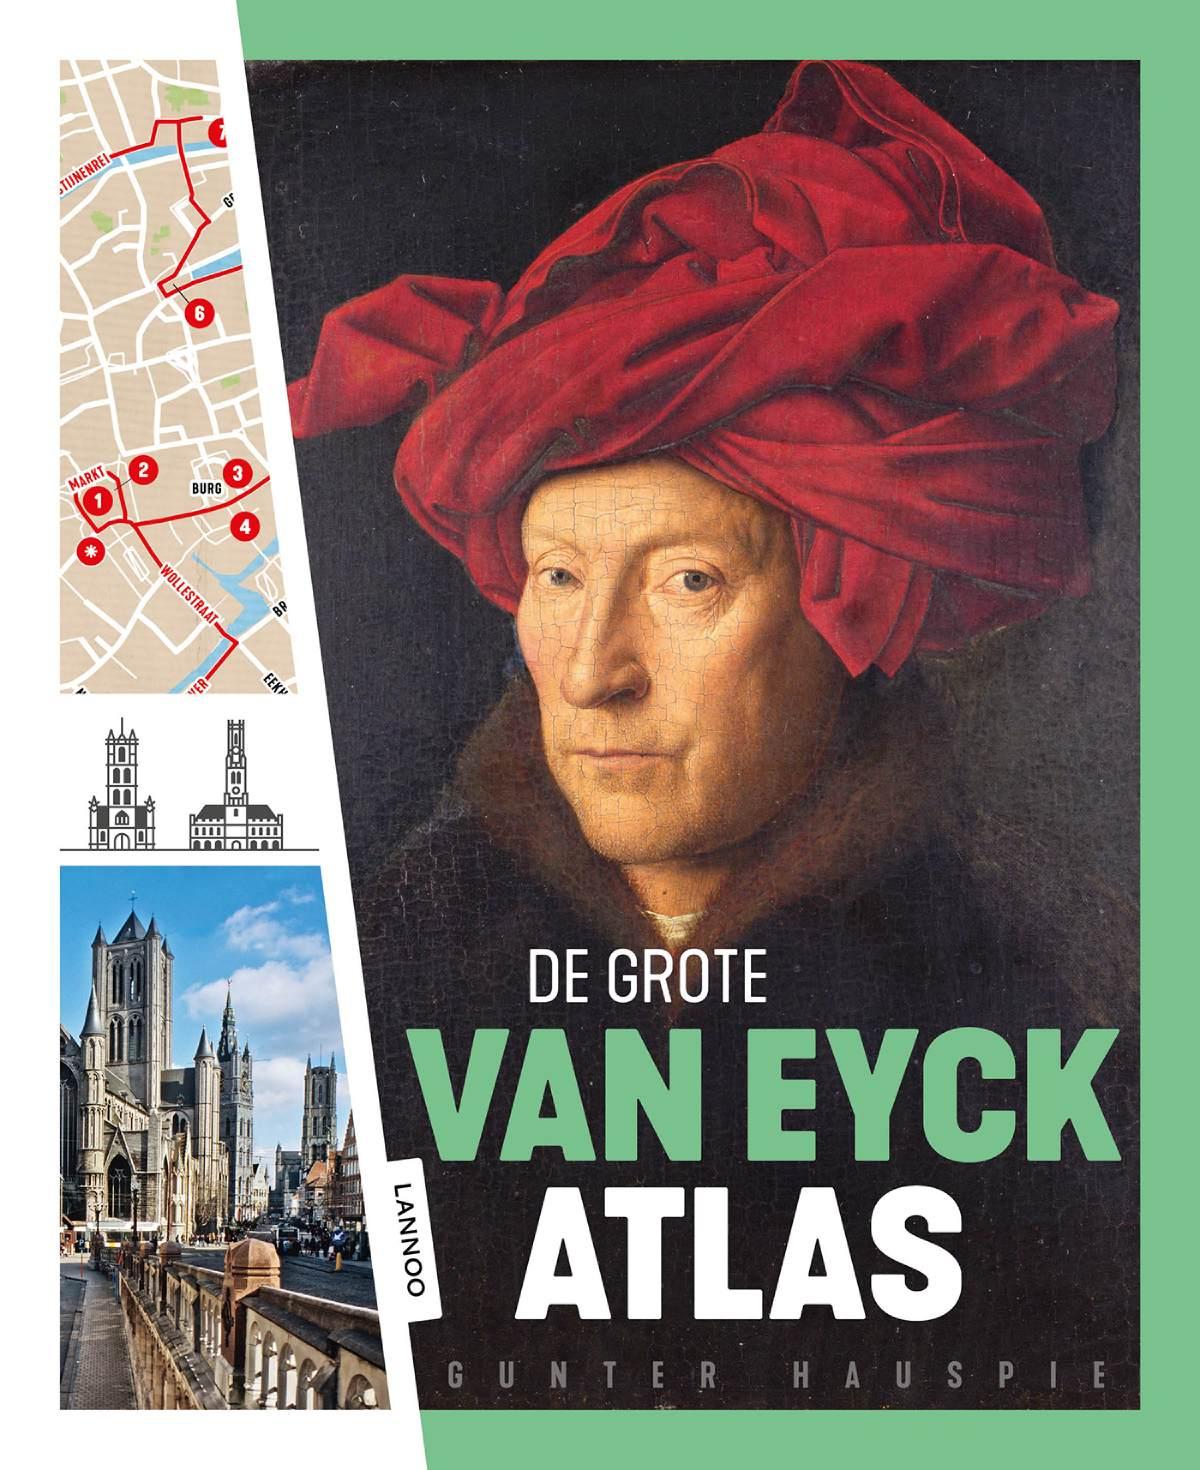 De Grote van Eyck Atlas